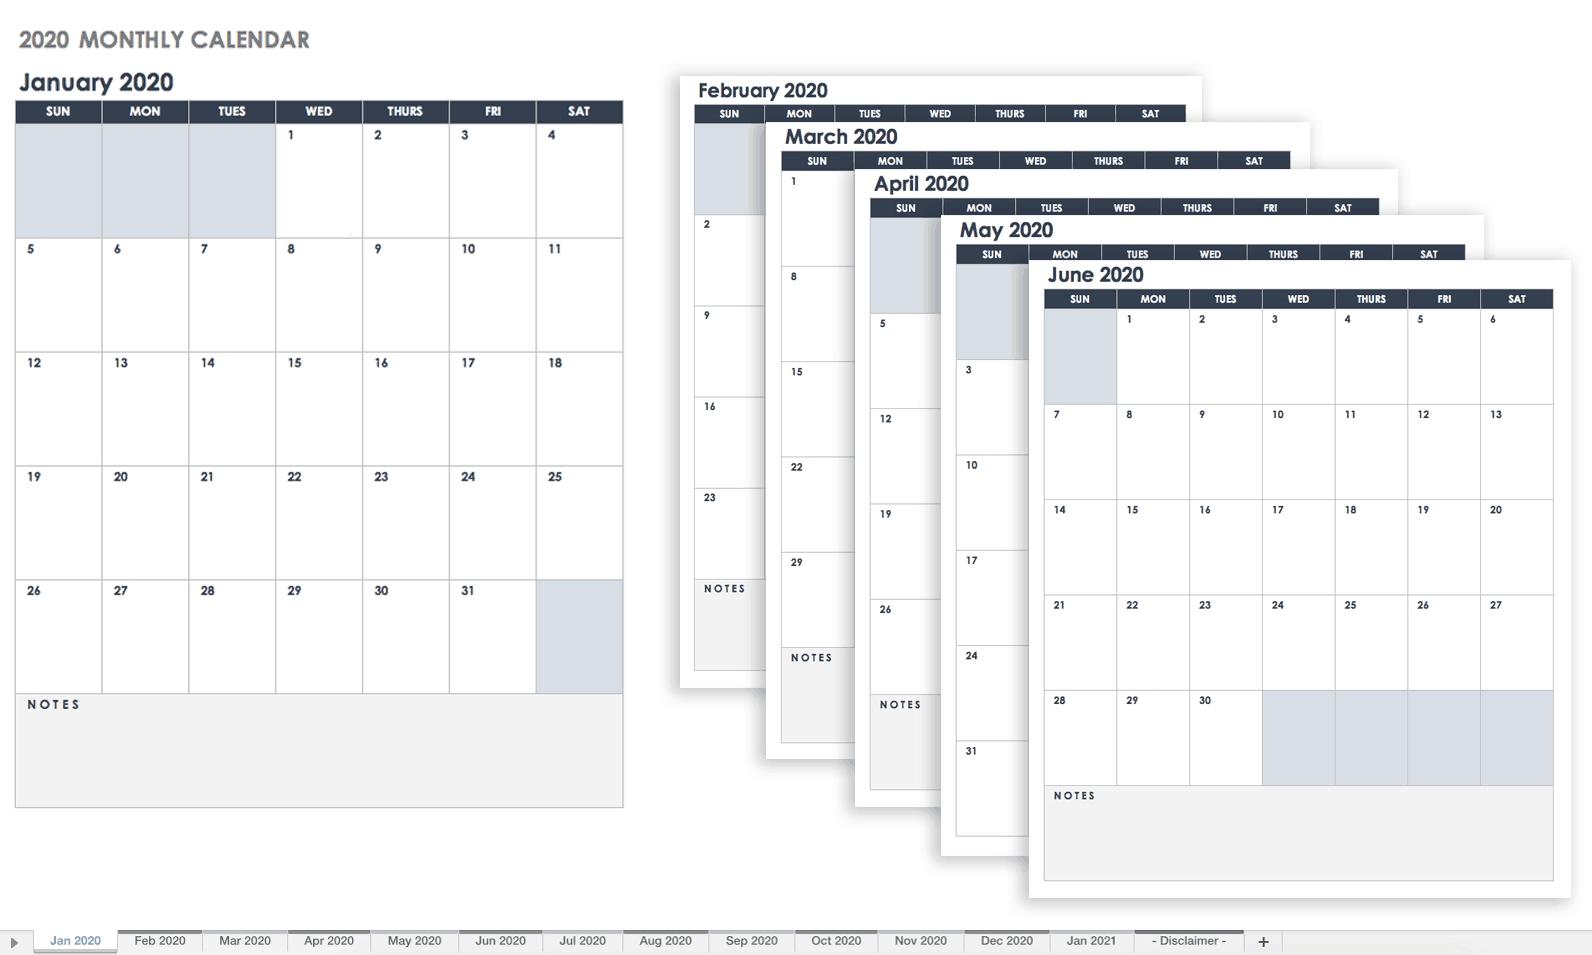 Free Google Calendar Templates | Smartsheet Remarkable 2020 Calendar Google Sheets